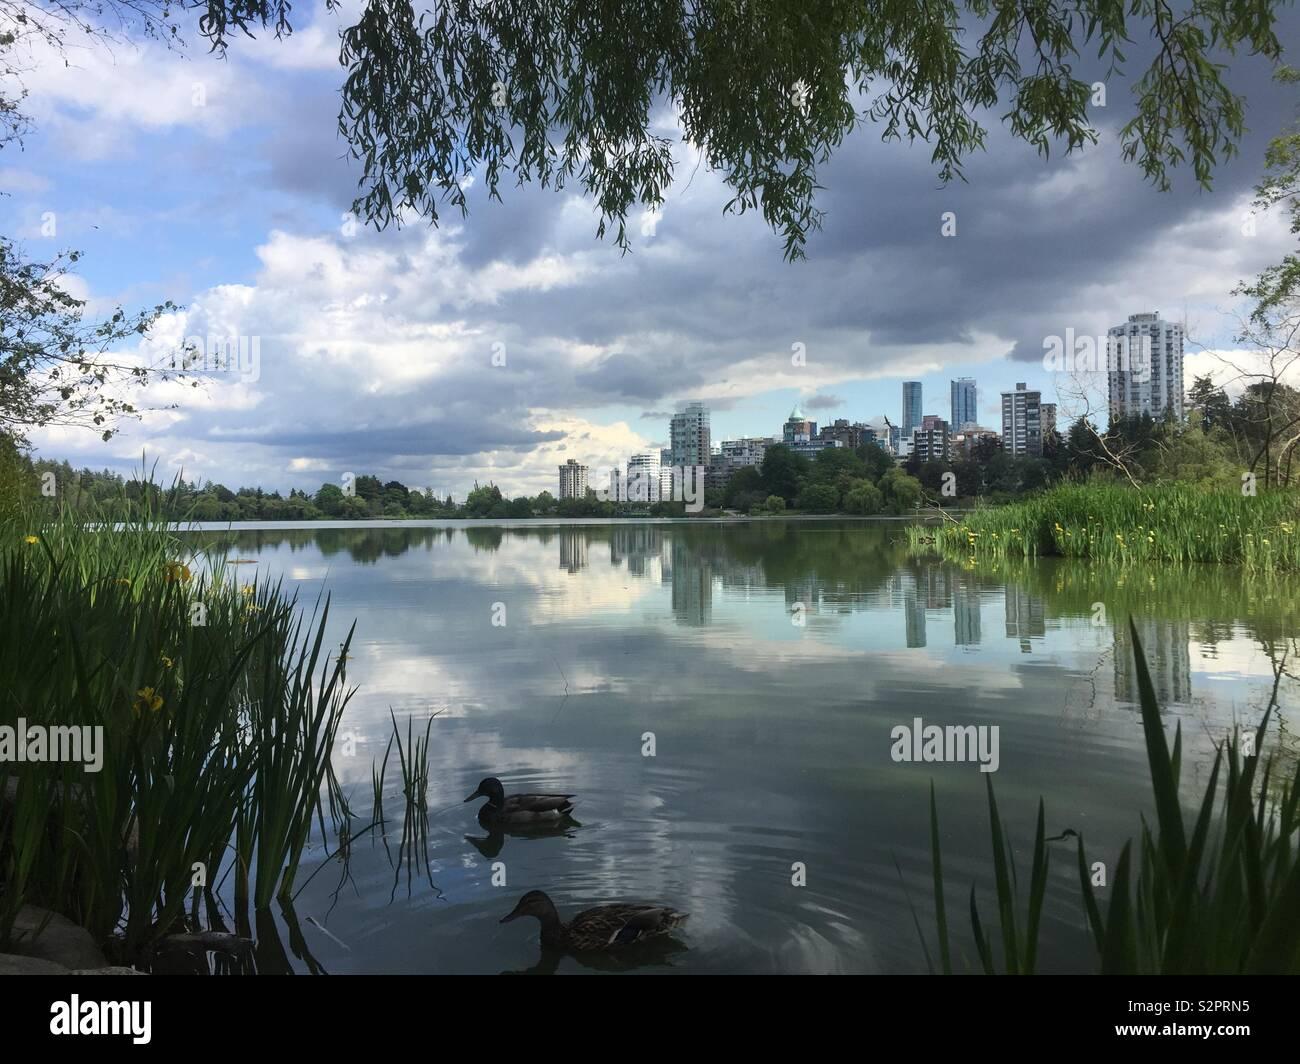 Lost Lagoon im Stanley Park, Vancouver, Kanada Stockbild